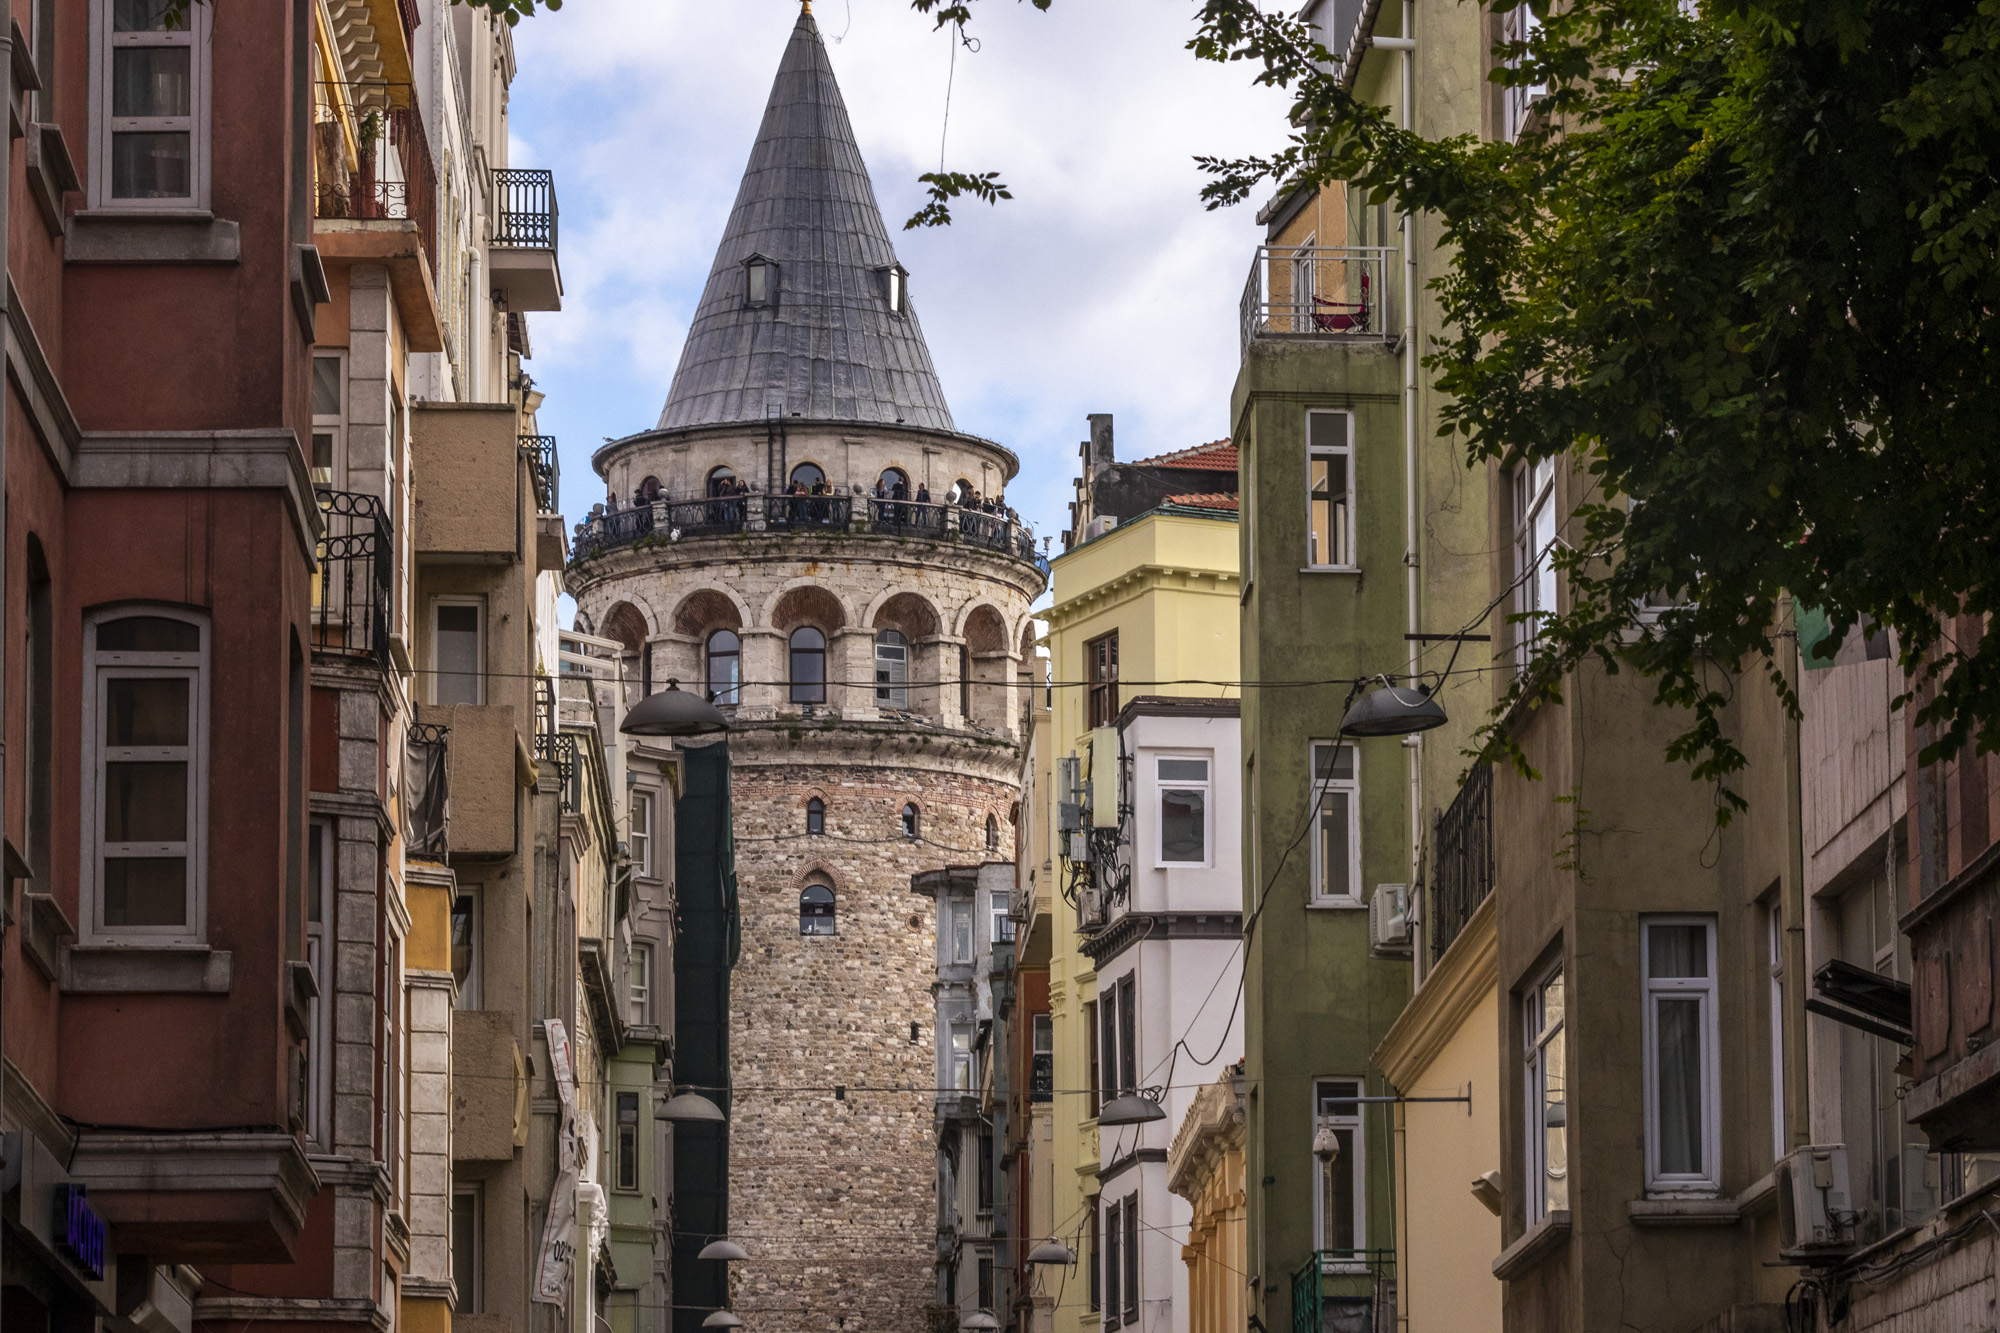 Galata Kulesi dans la ville d'İstanbul en Turquie